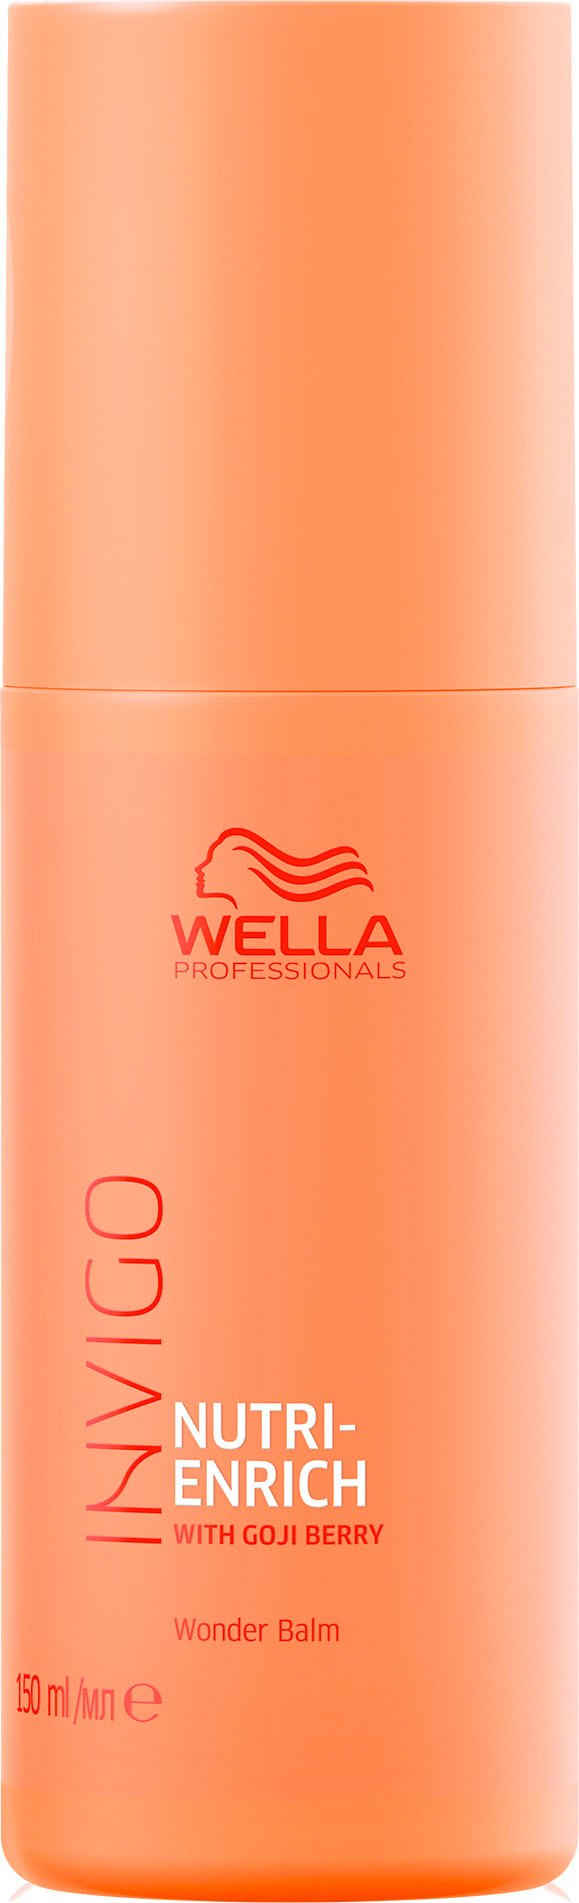 Wella Professionals Haarbalsam »Invigo Nutri-Enrich Wonder Balm«, nährend